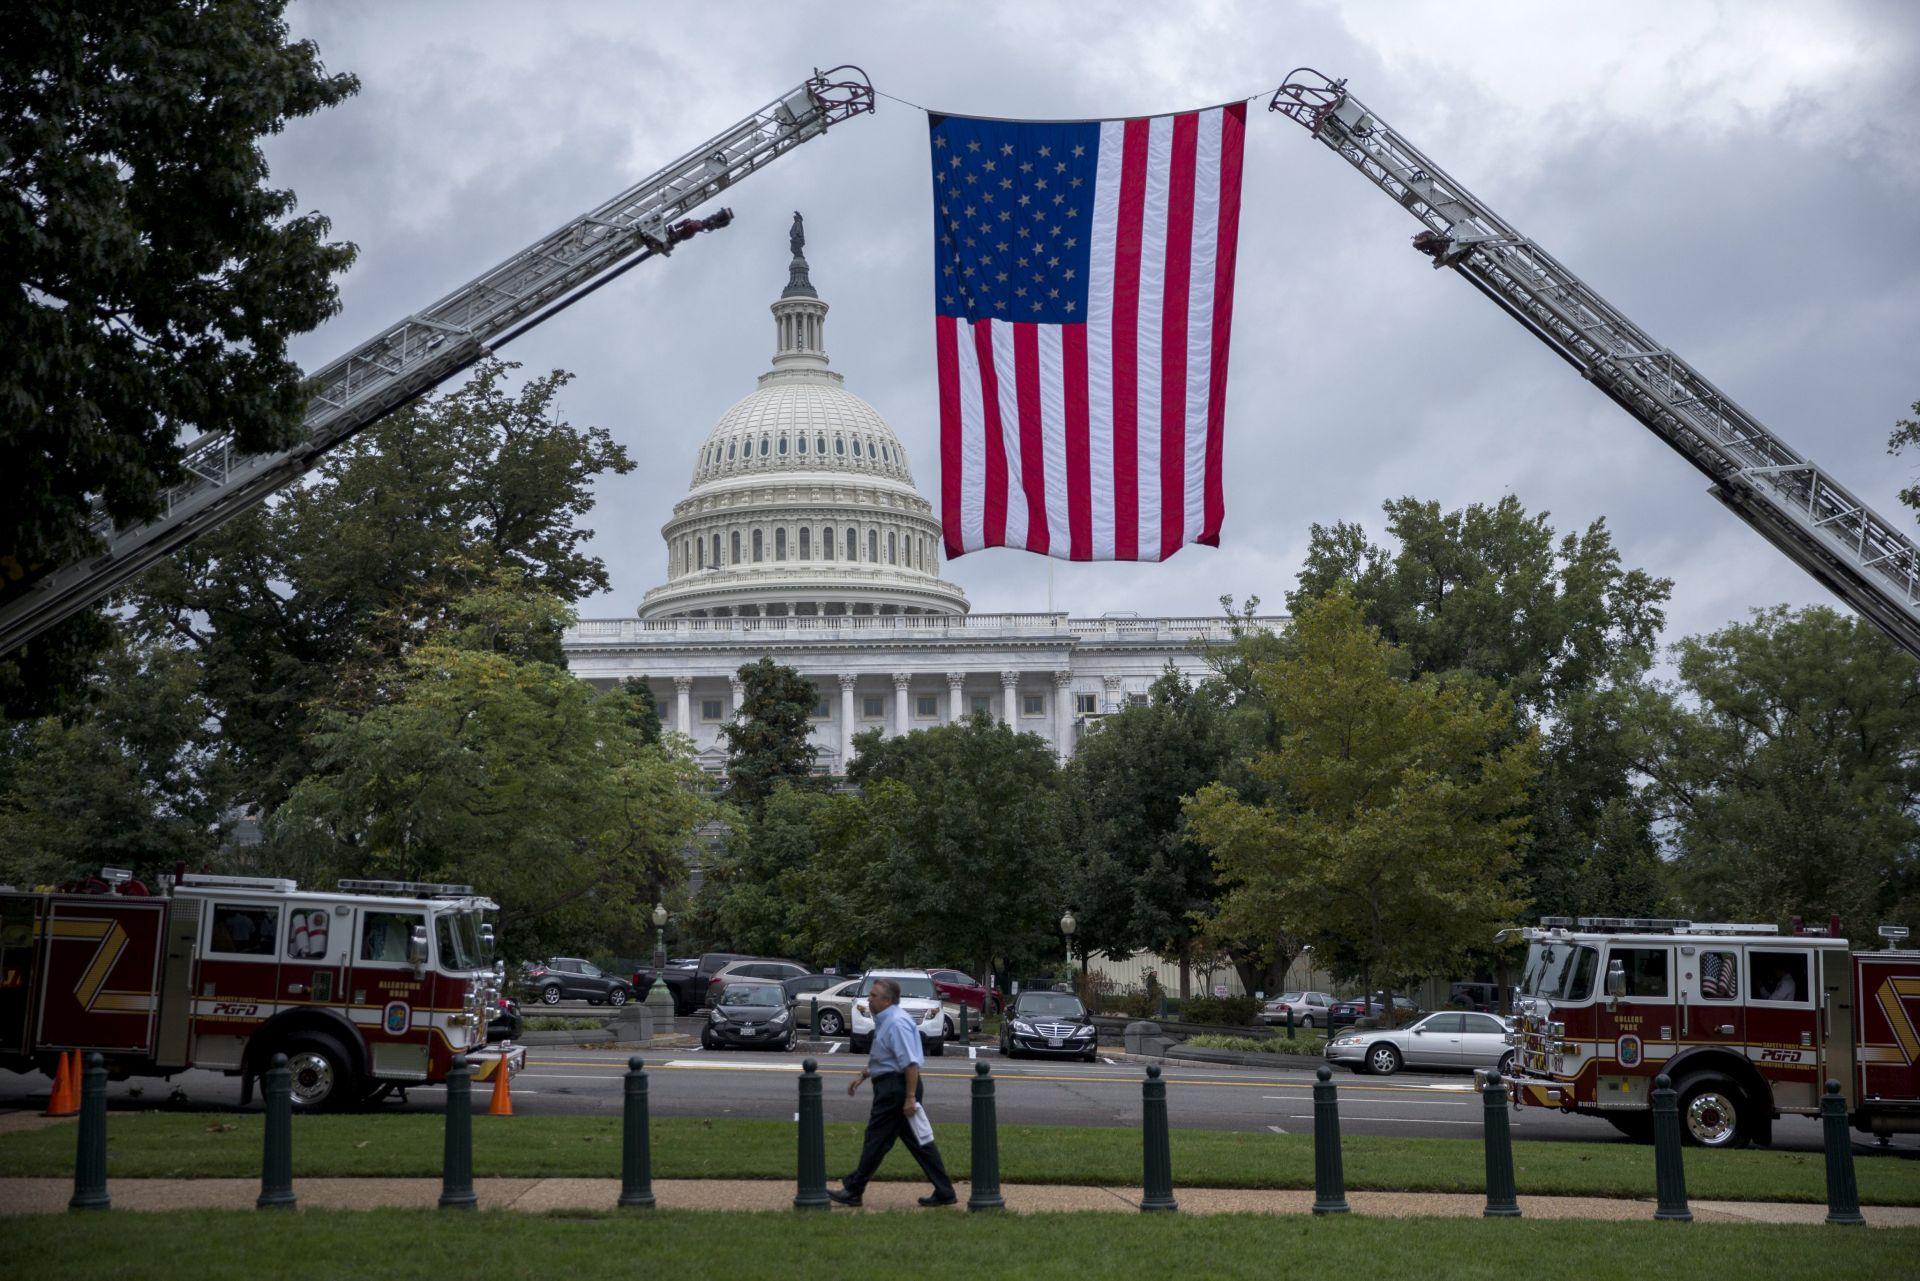 AMERIKA BIRA Republikanci zadržali kontrolu nad oba doma Kongresa